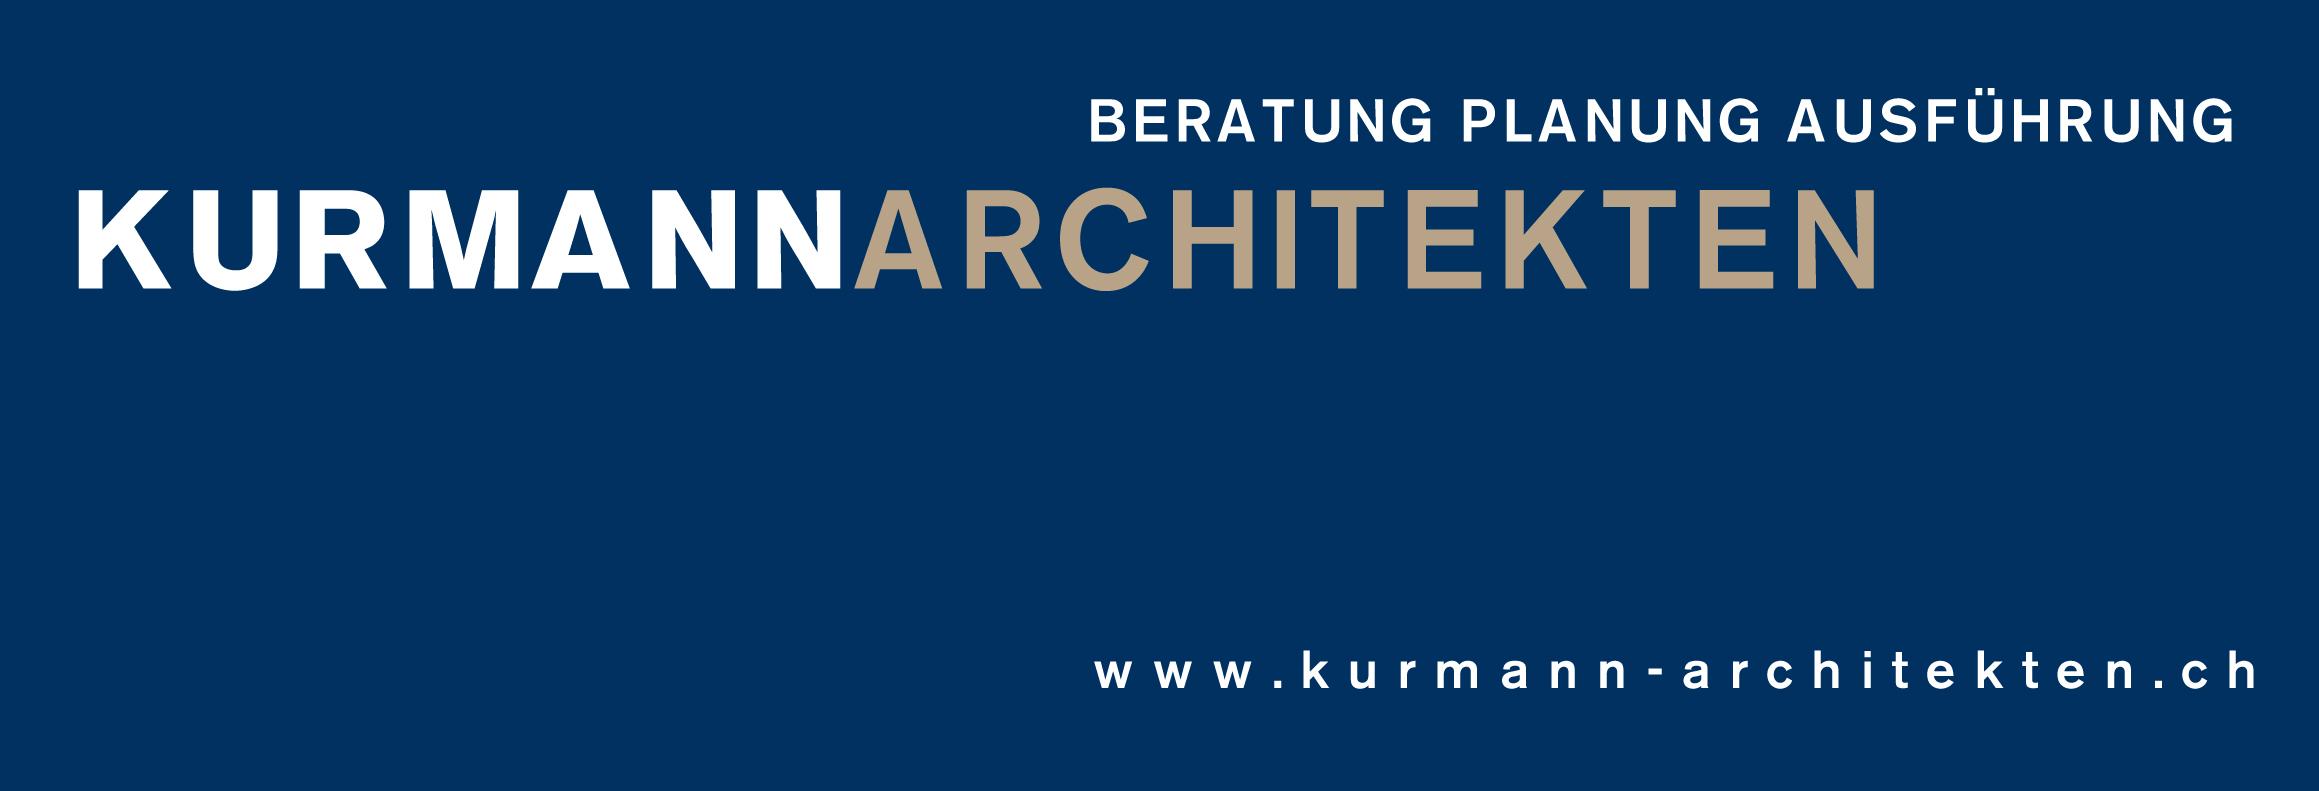 Kurmann Architekten